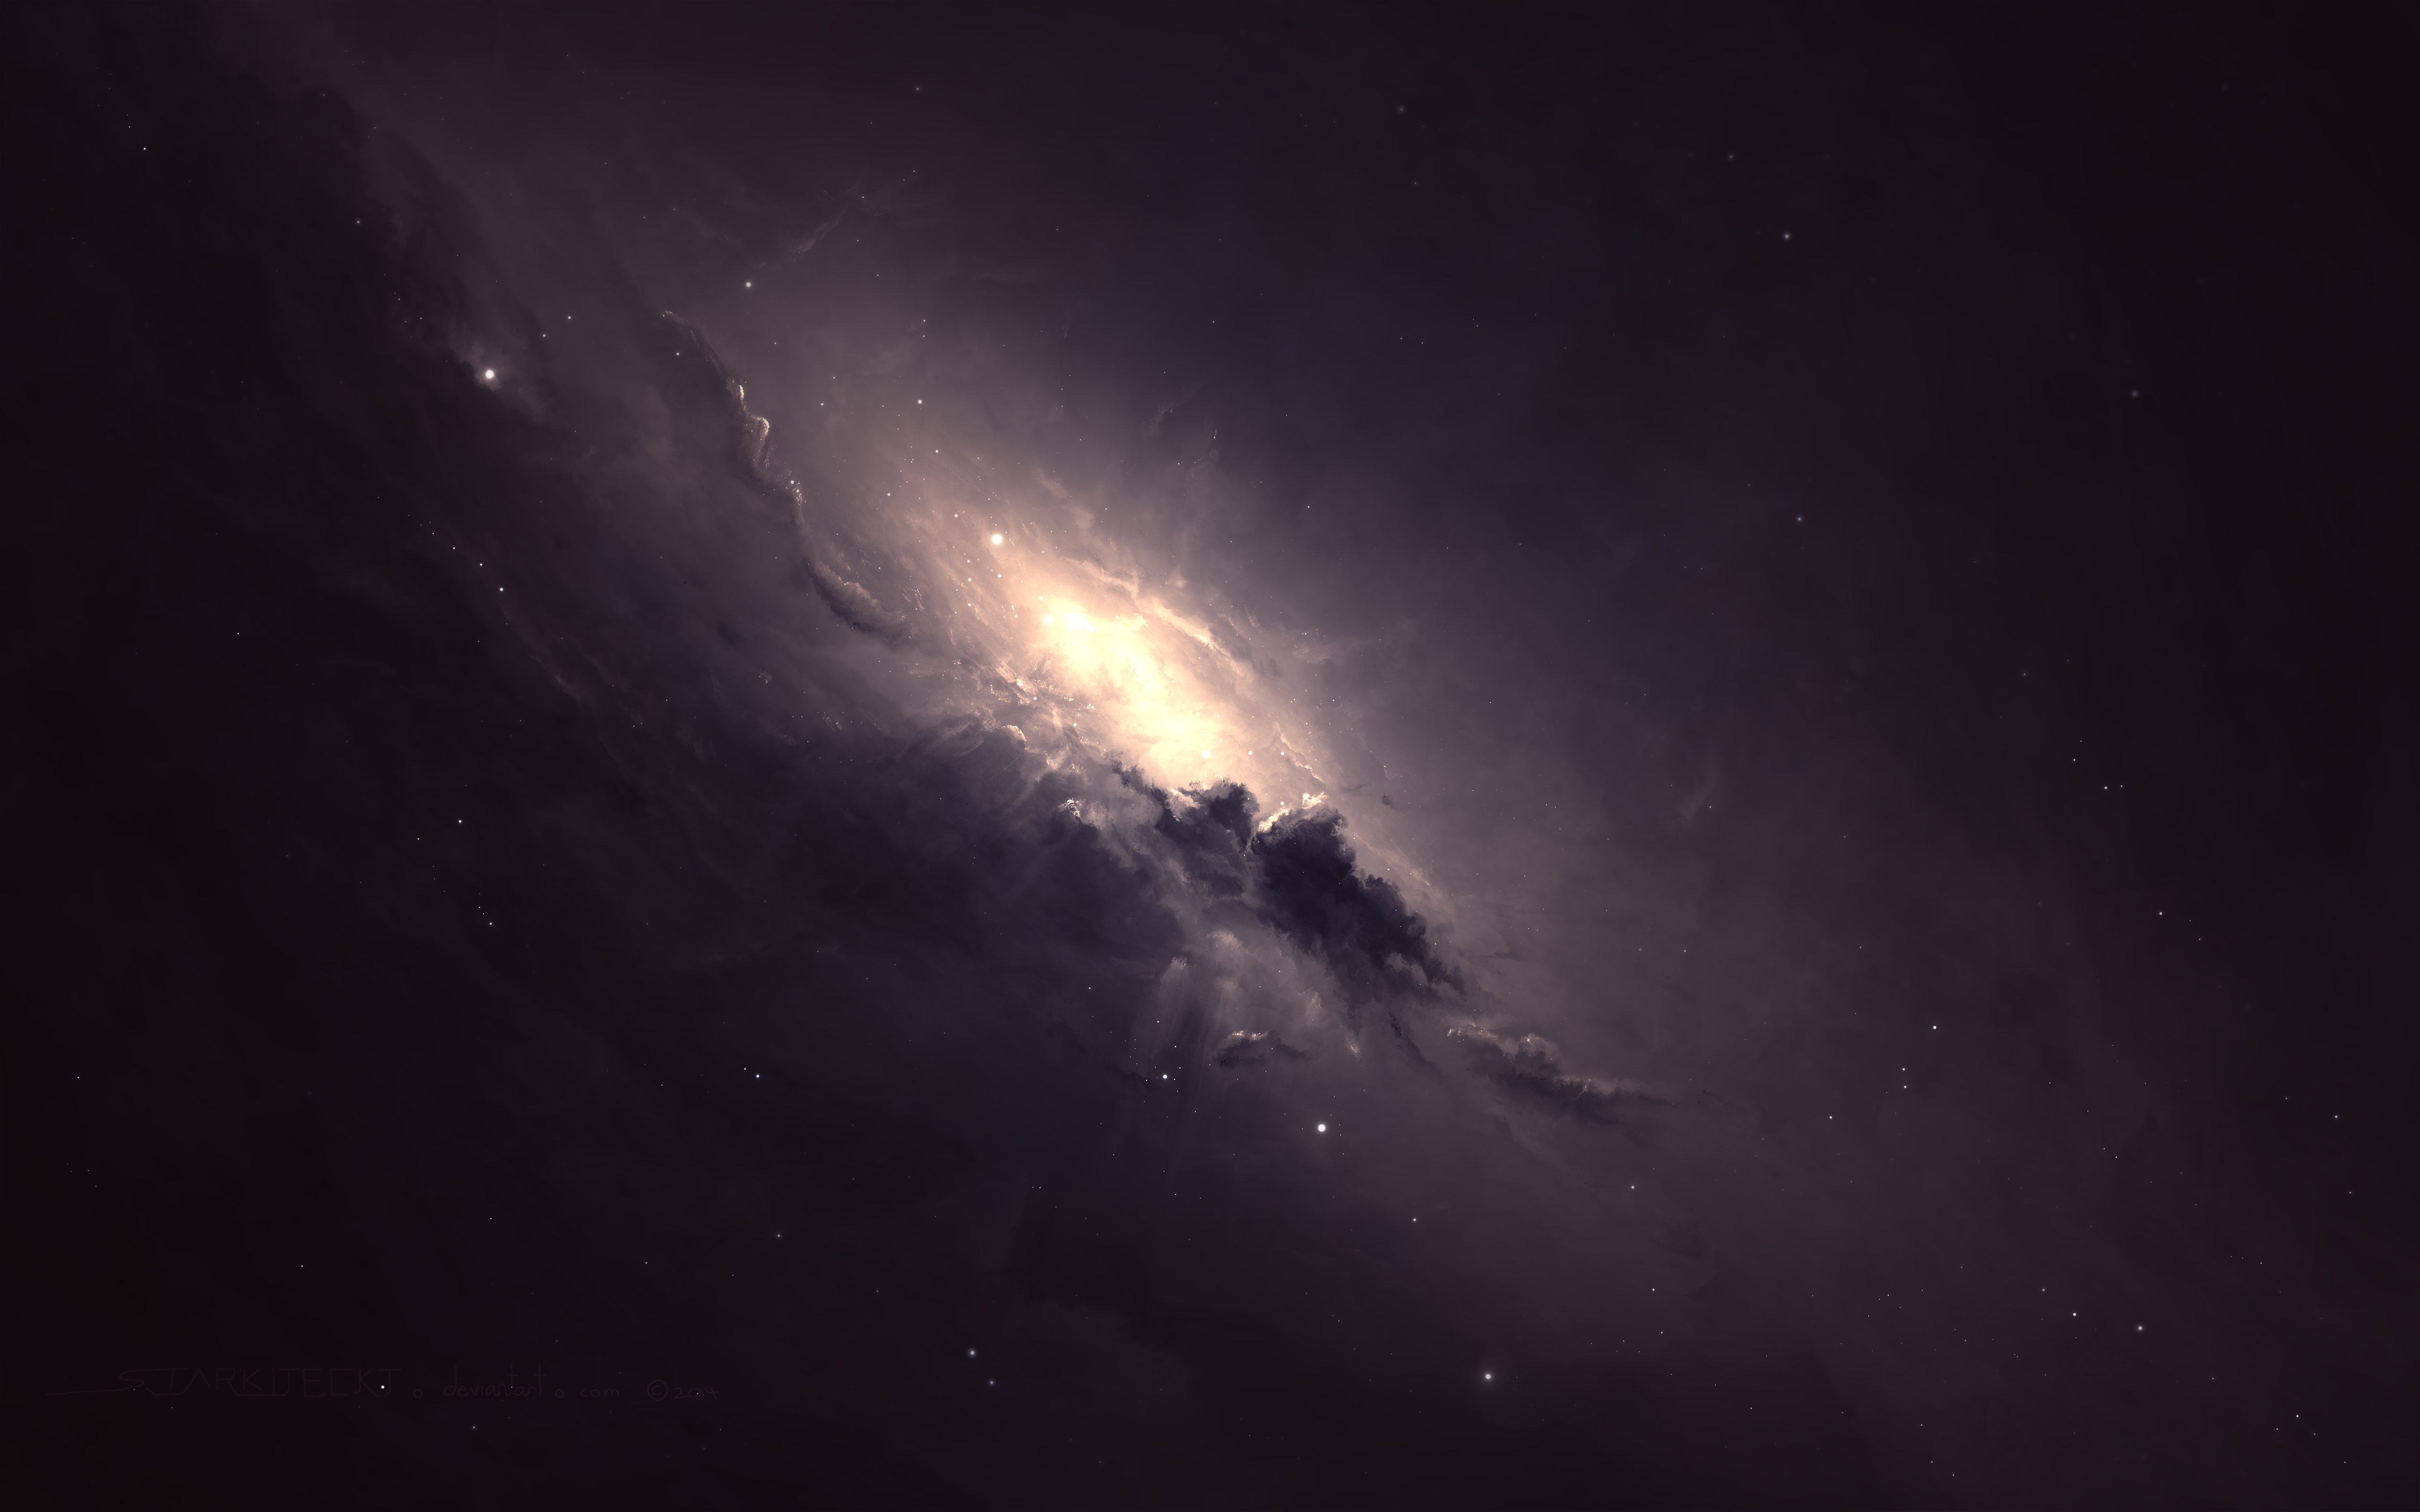 Nebulous gem 5k retina ultra hd wallpaper background image 5120x3200 id 562947 wallpaper - 5120x3200 resolution ...